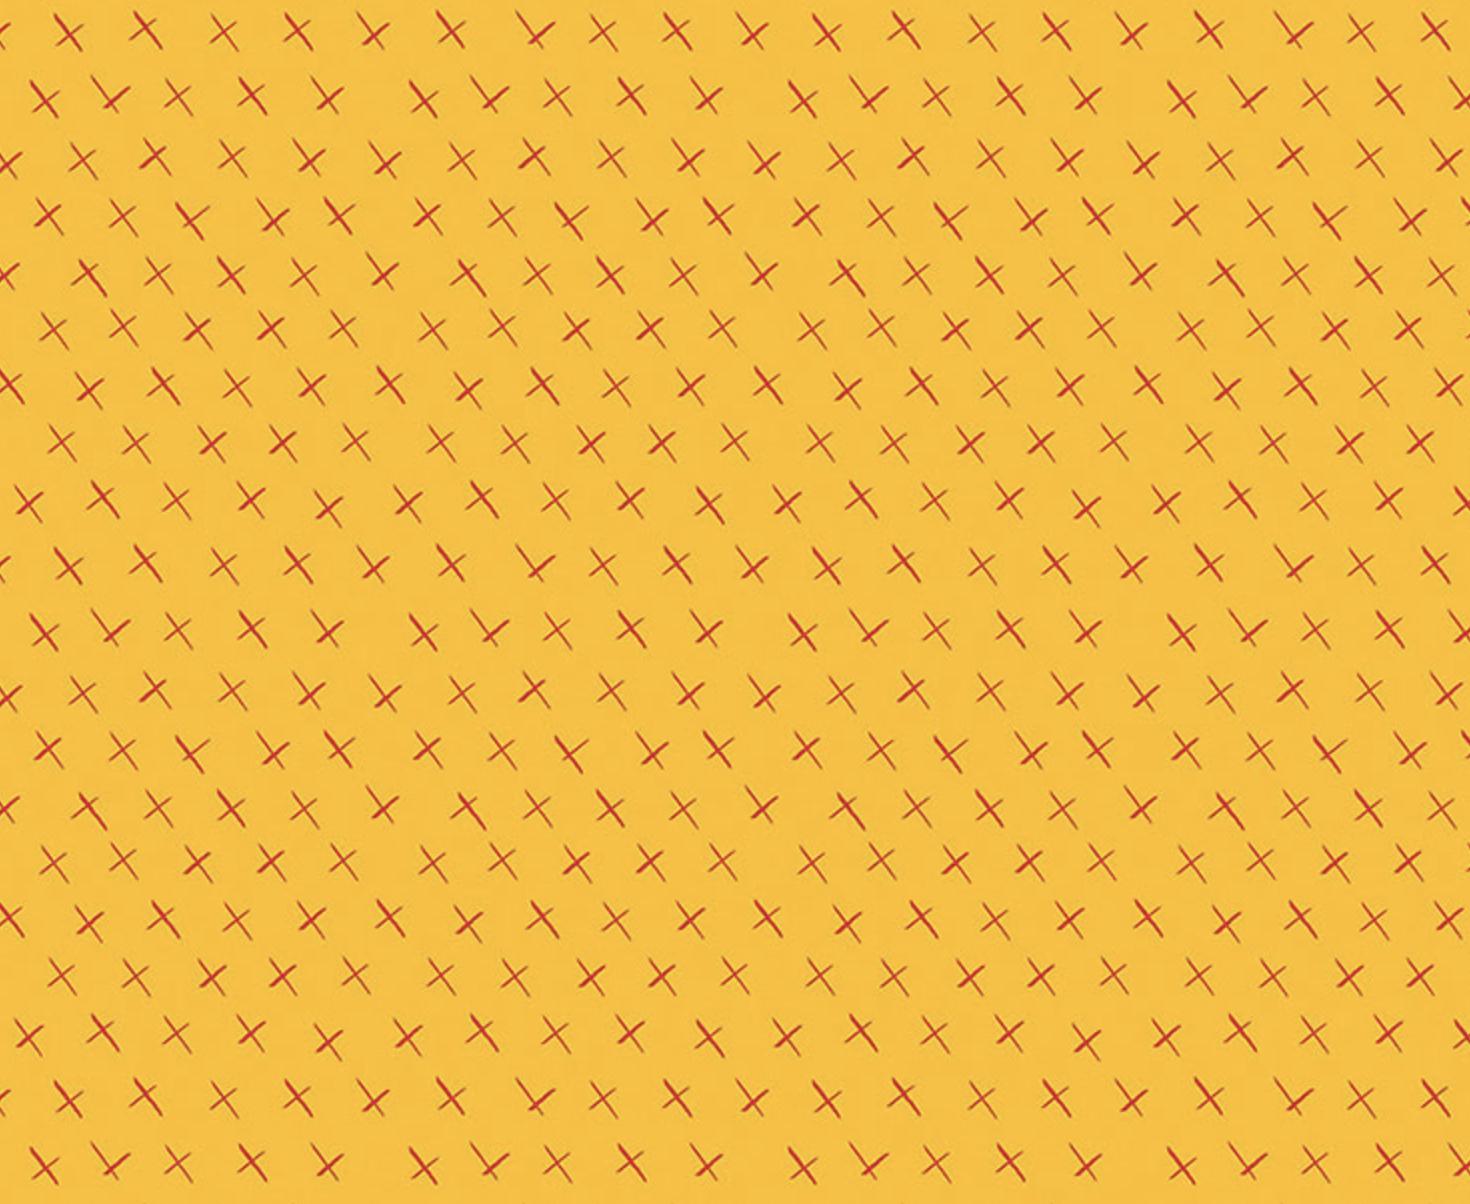 Benartex Fabrics - Christa Watson - Modern Marks - Crossmarks - Gold